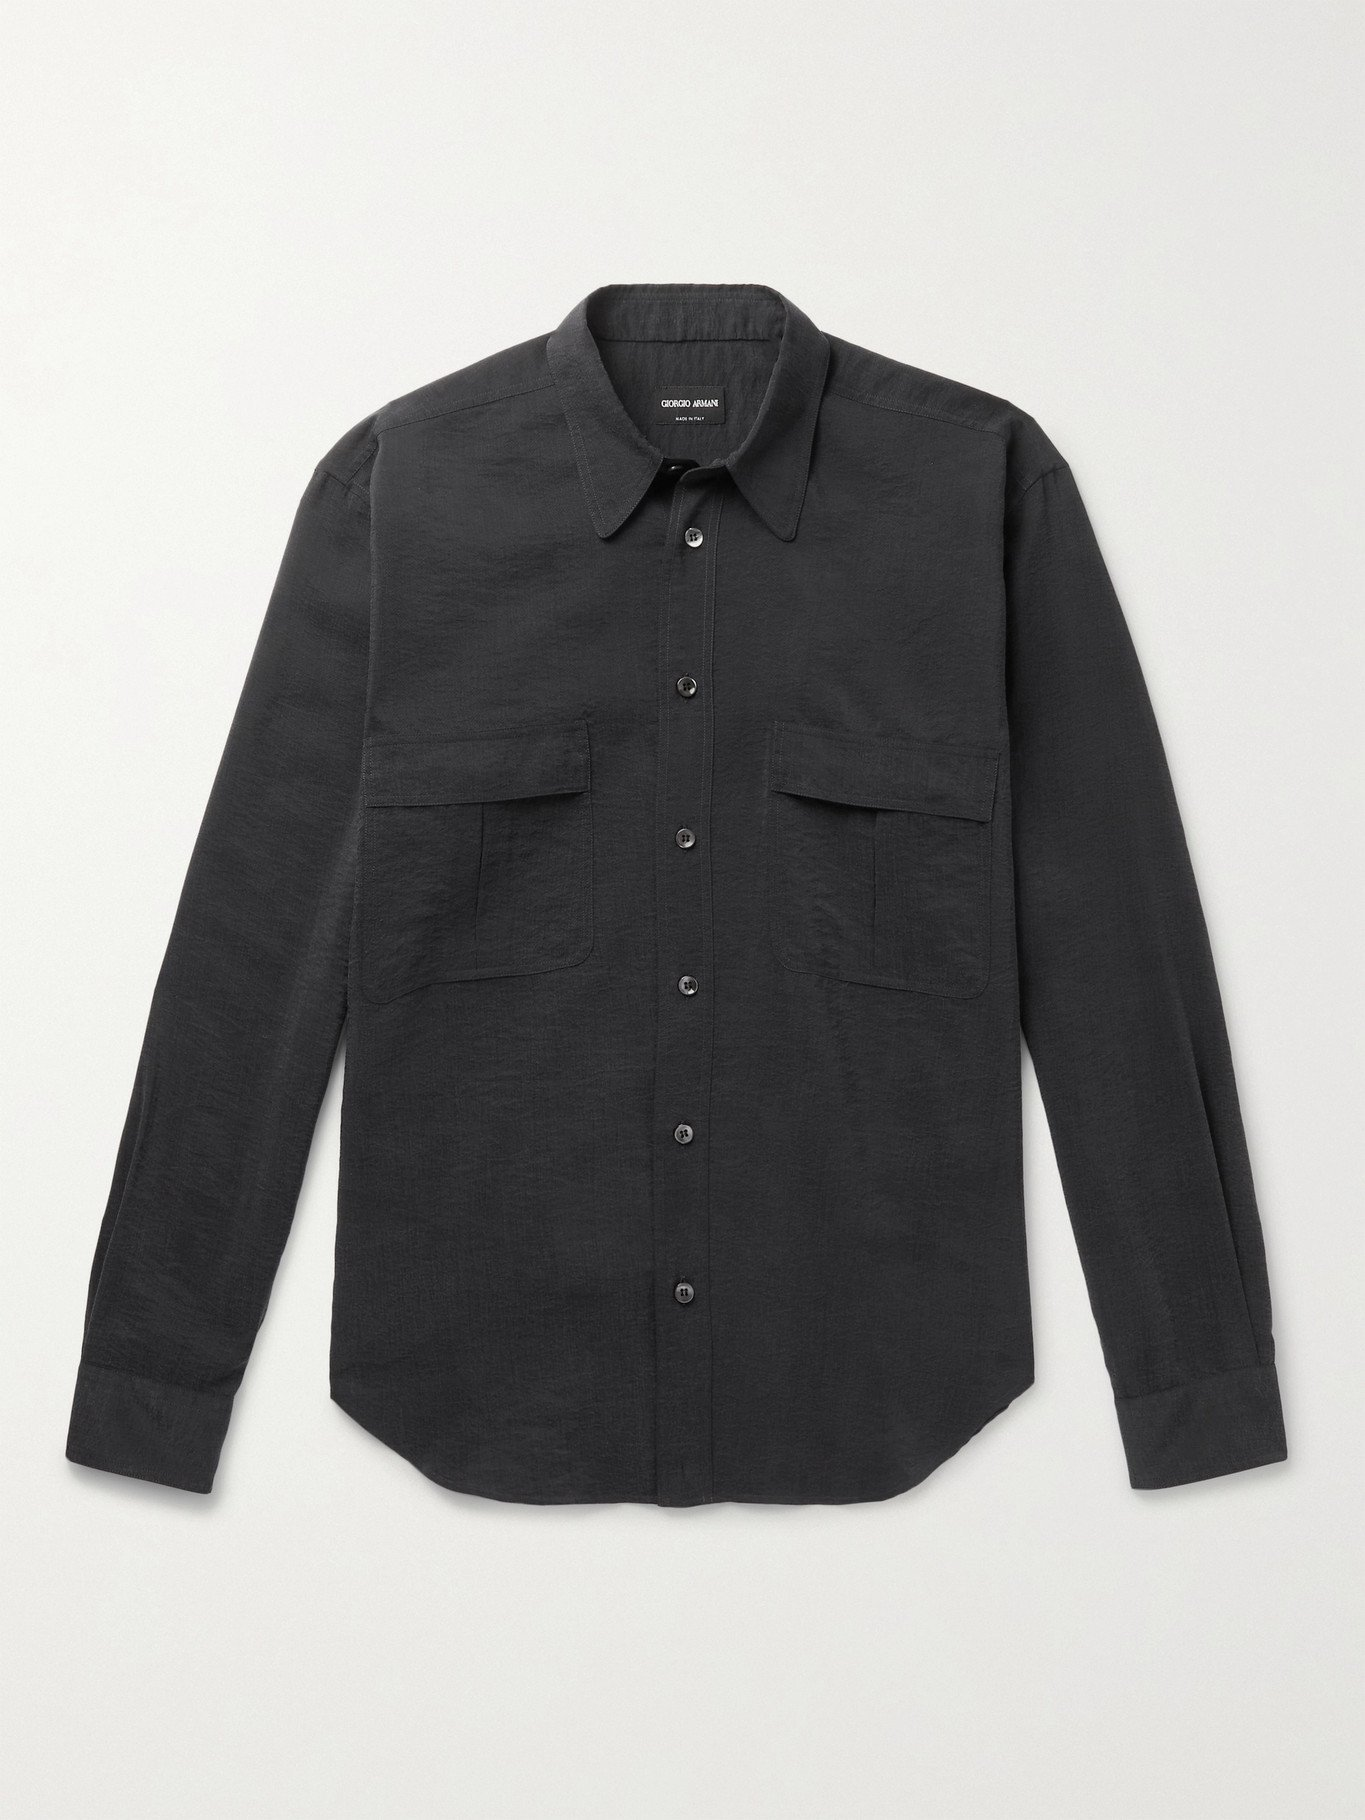 GIORGIO ARMANI - Silk-Blend Shirt - Multi - EU 39